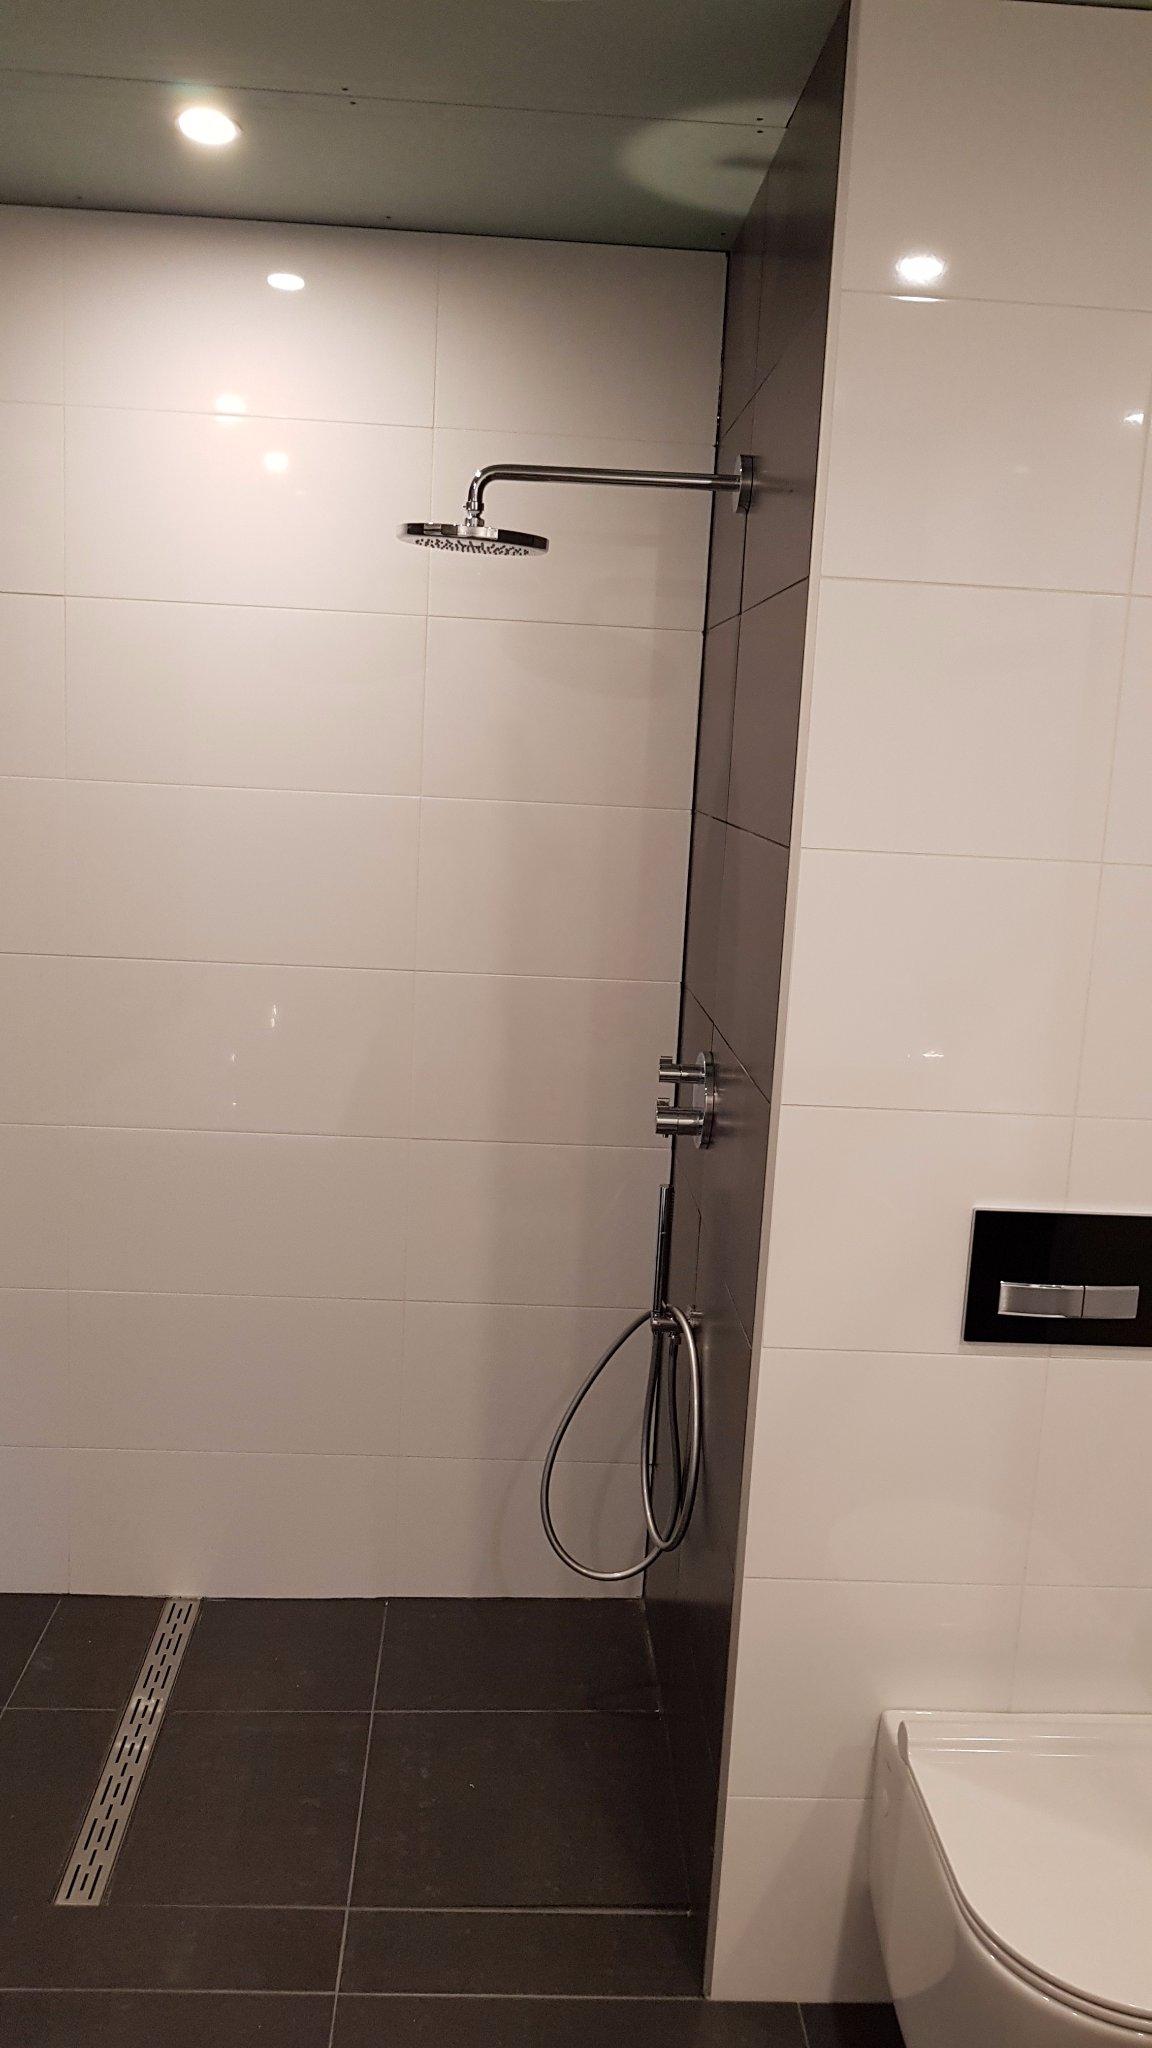 Badkamer afkitten werkspot - Badkamer in lengte ...